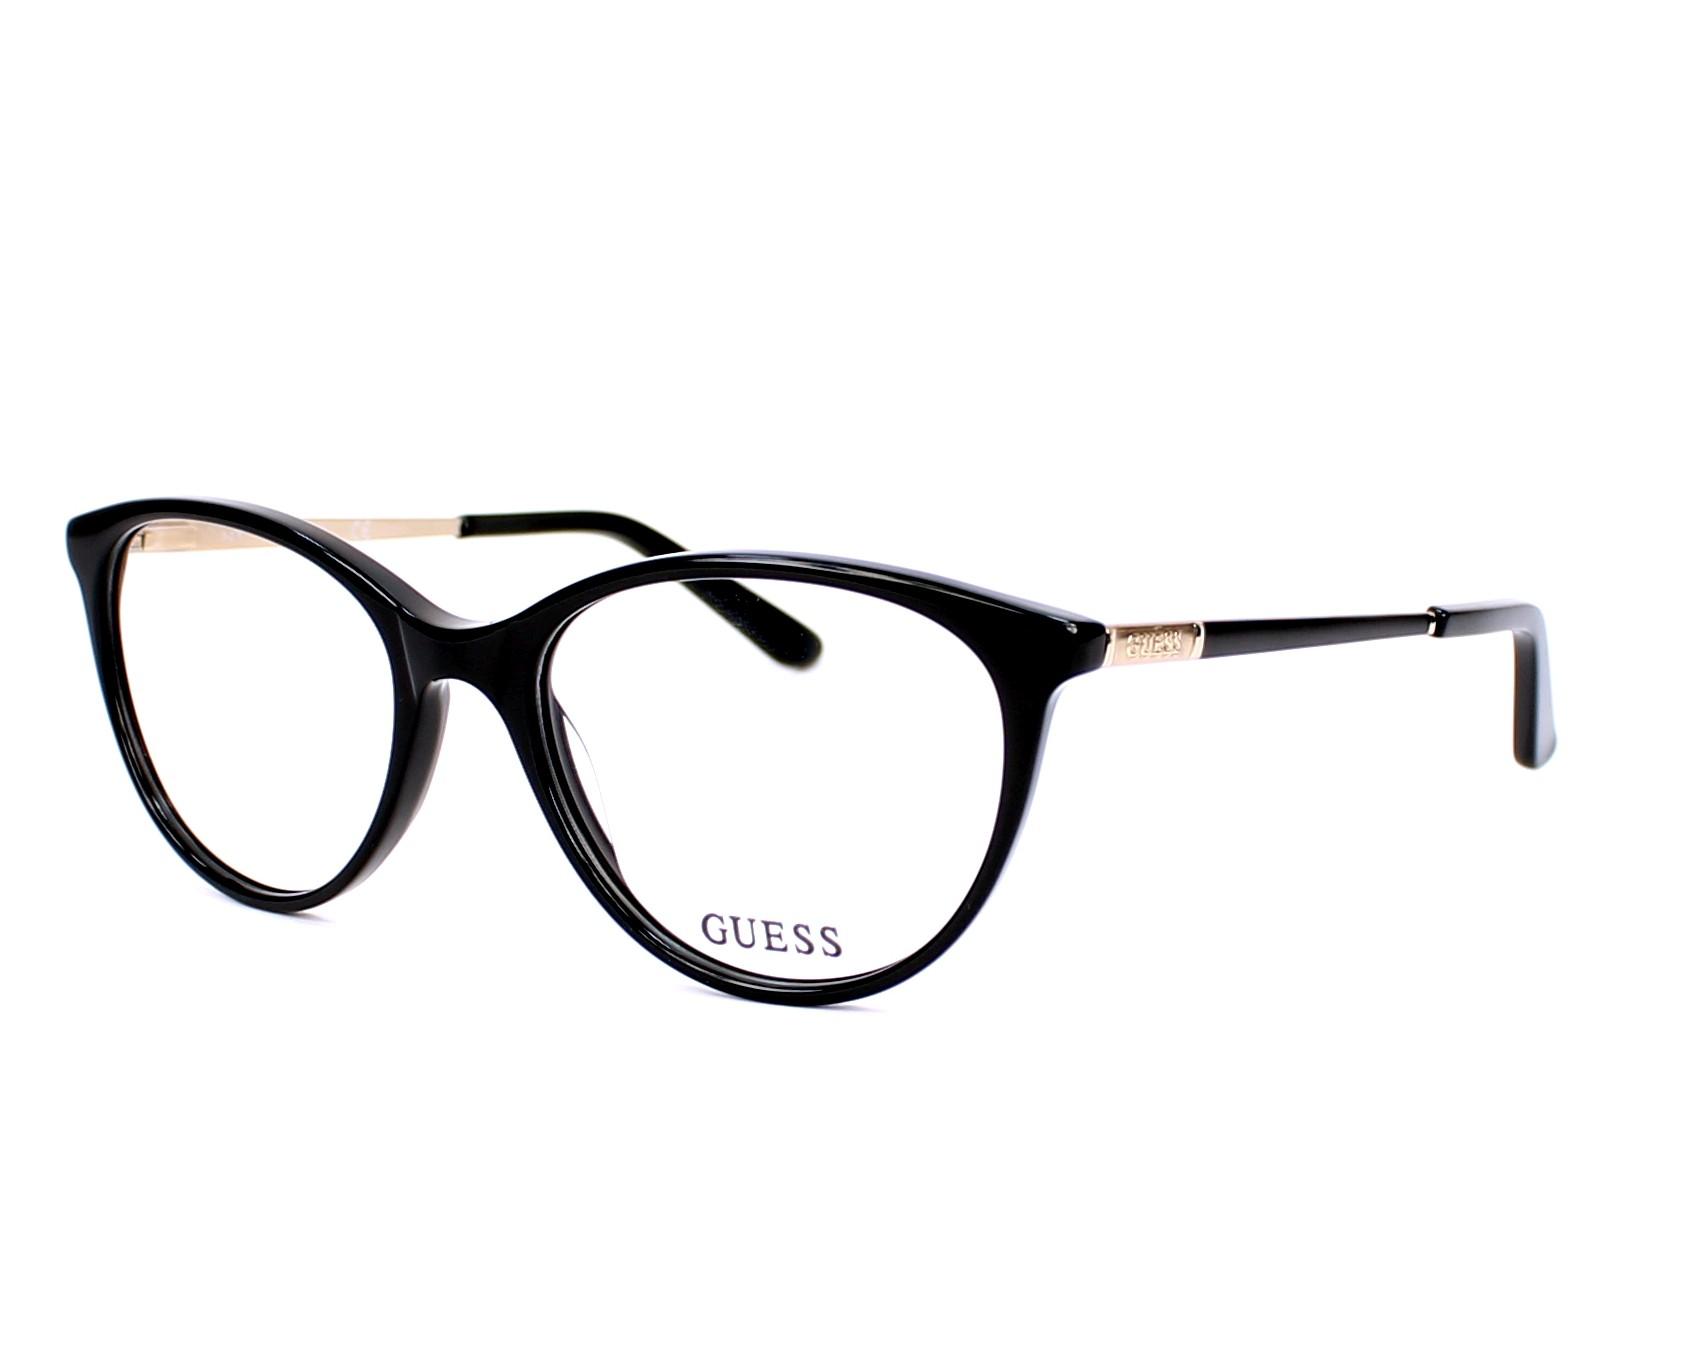 9280bc3b203 eyeglasses Guess GU-2565 005 52-17 Black Gold Copper profile view